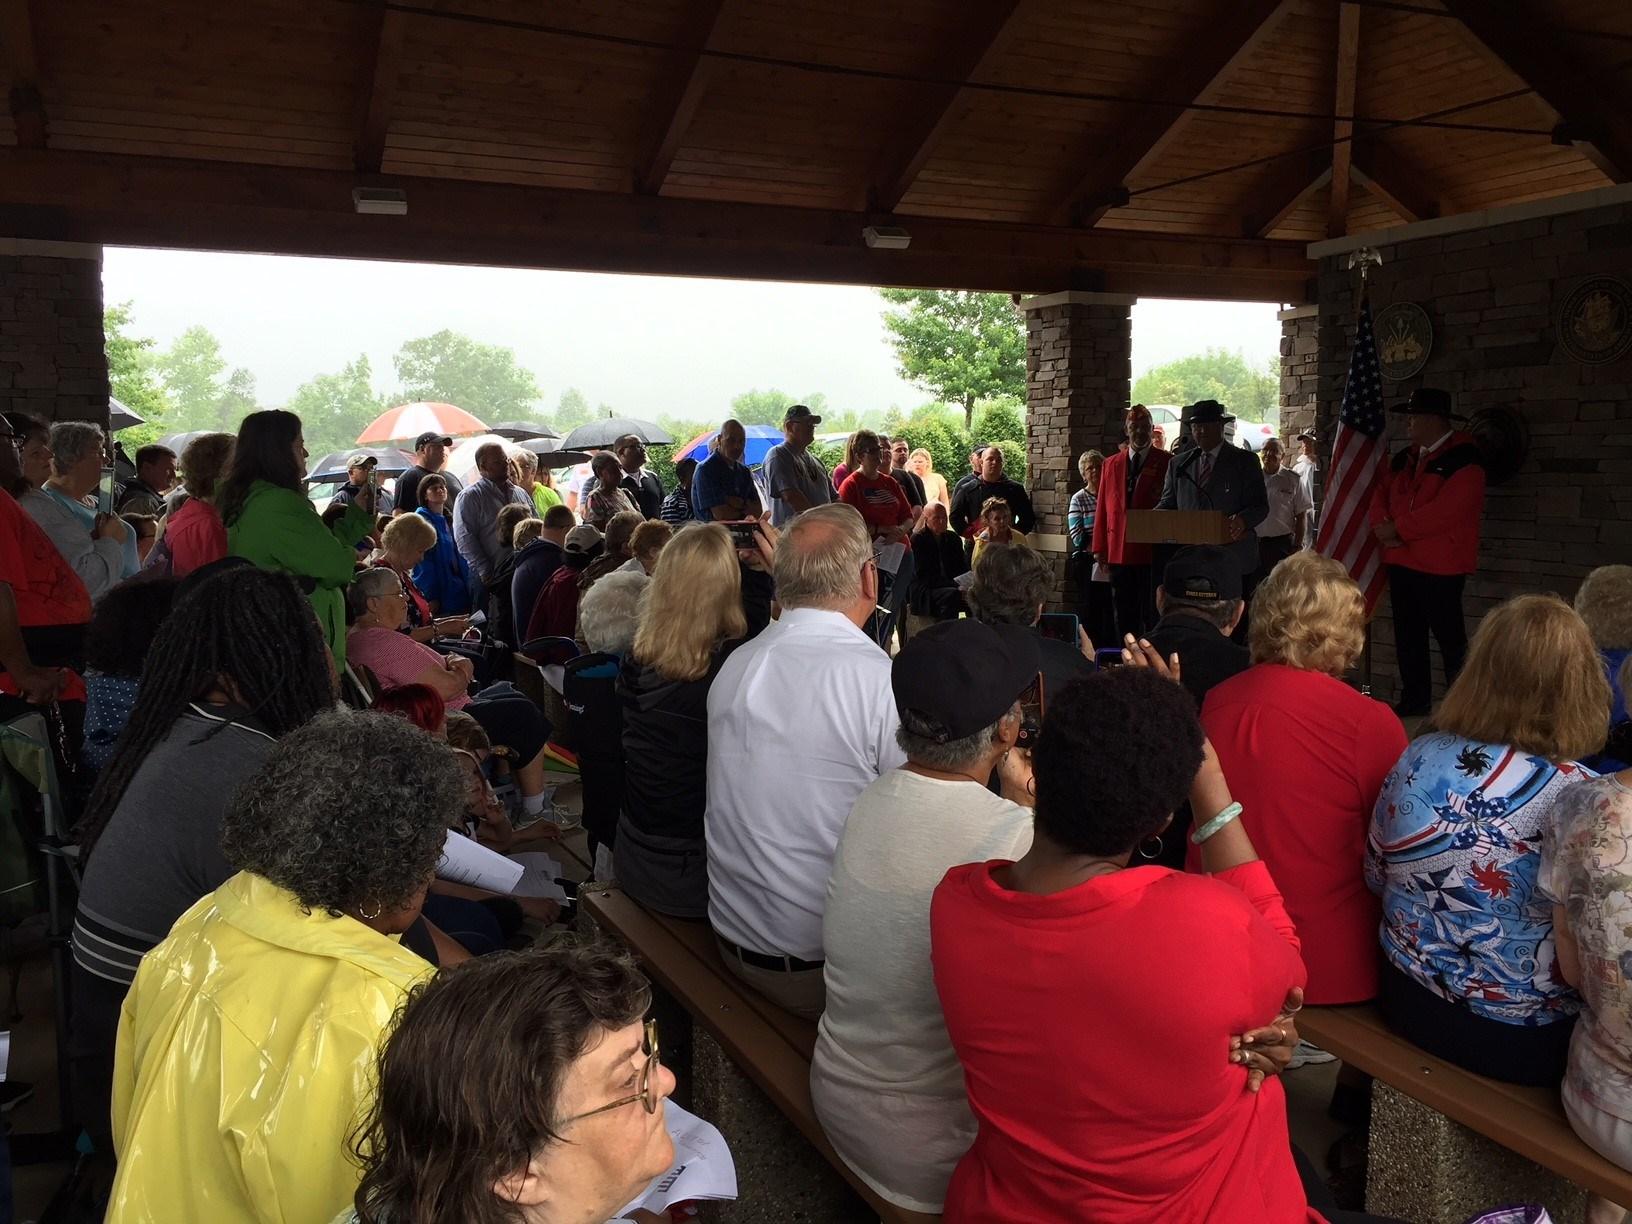 Ceremony held under shelter at MJ Dolly Cooper Veterans Cemetery (FOX Carolina/ May 28, 2018)